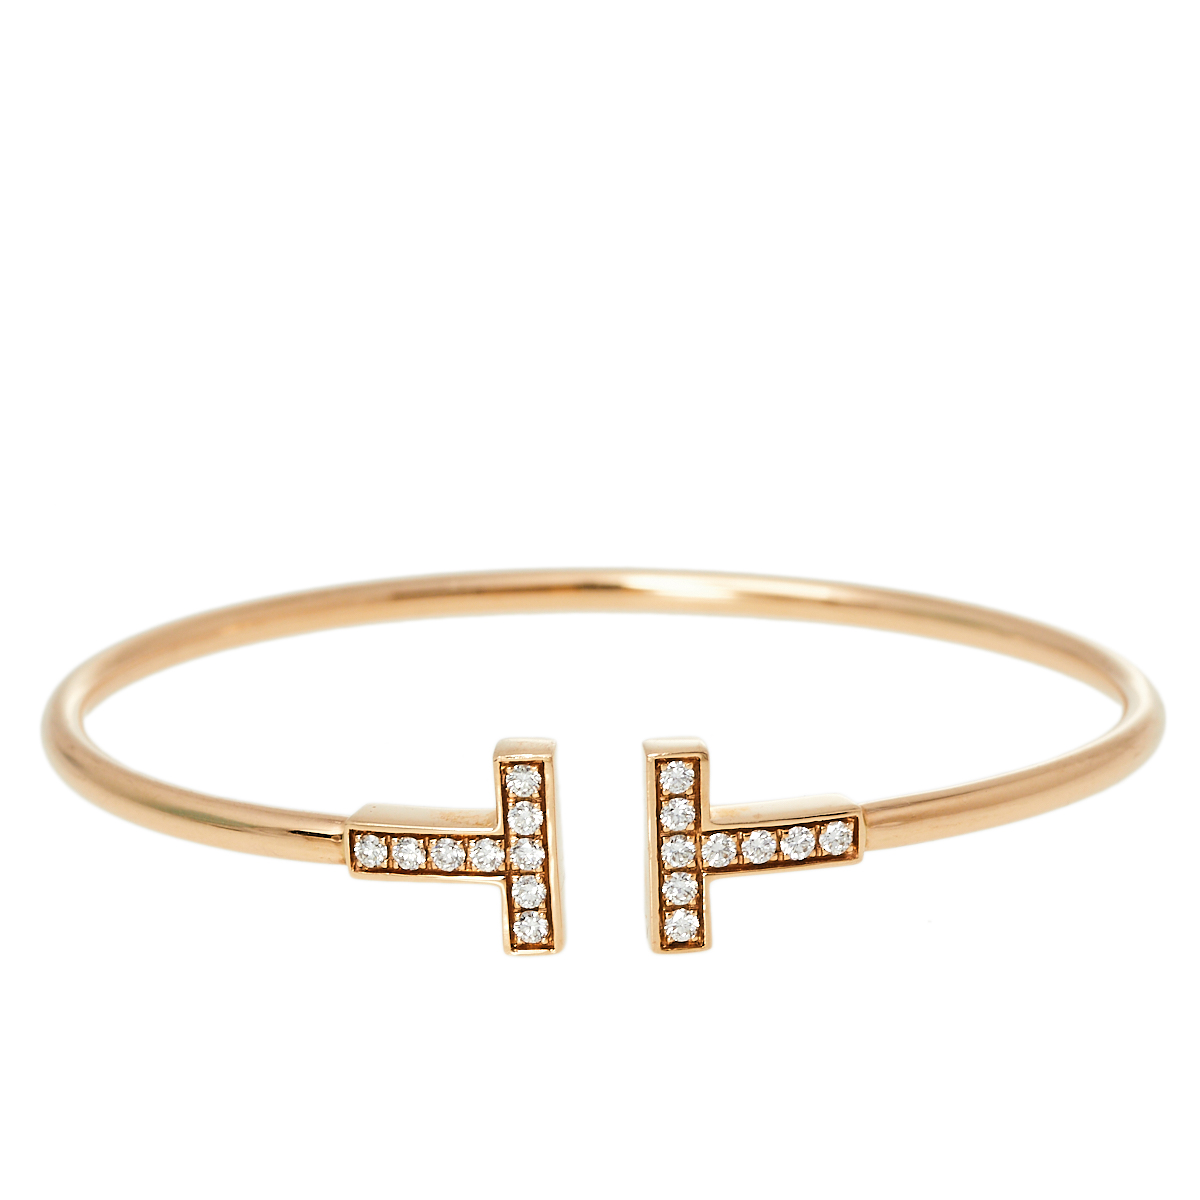 Pre-owned Tiffany & Co Tiffany T Wire Diamond 18k Rose Gold Narrow Open Cuff Bracelet